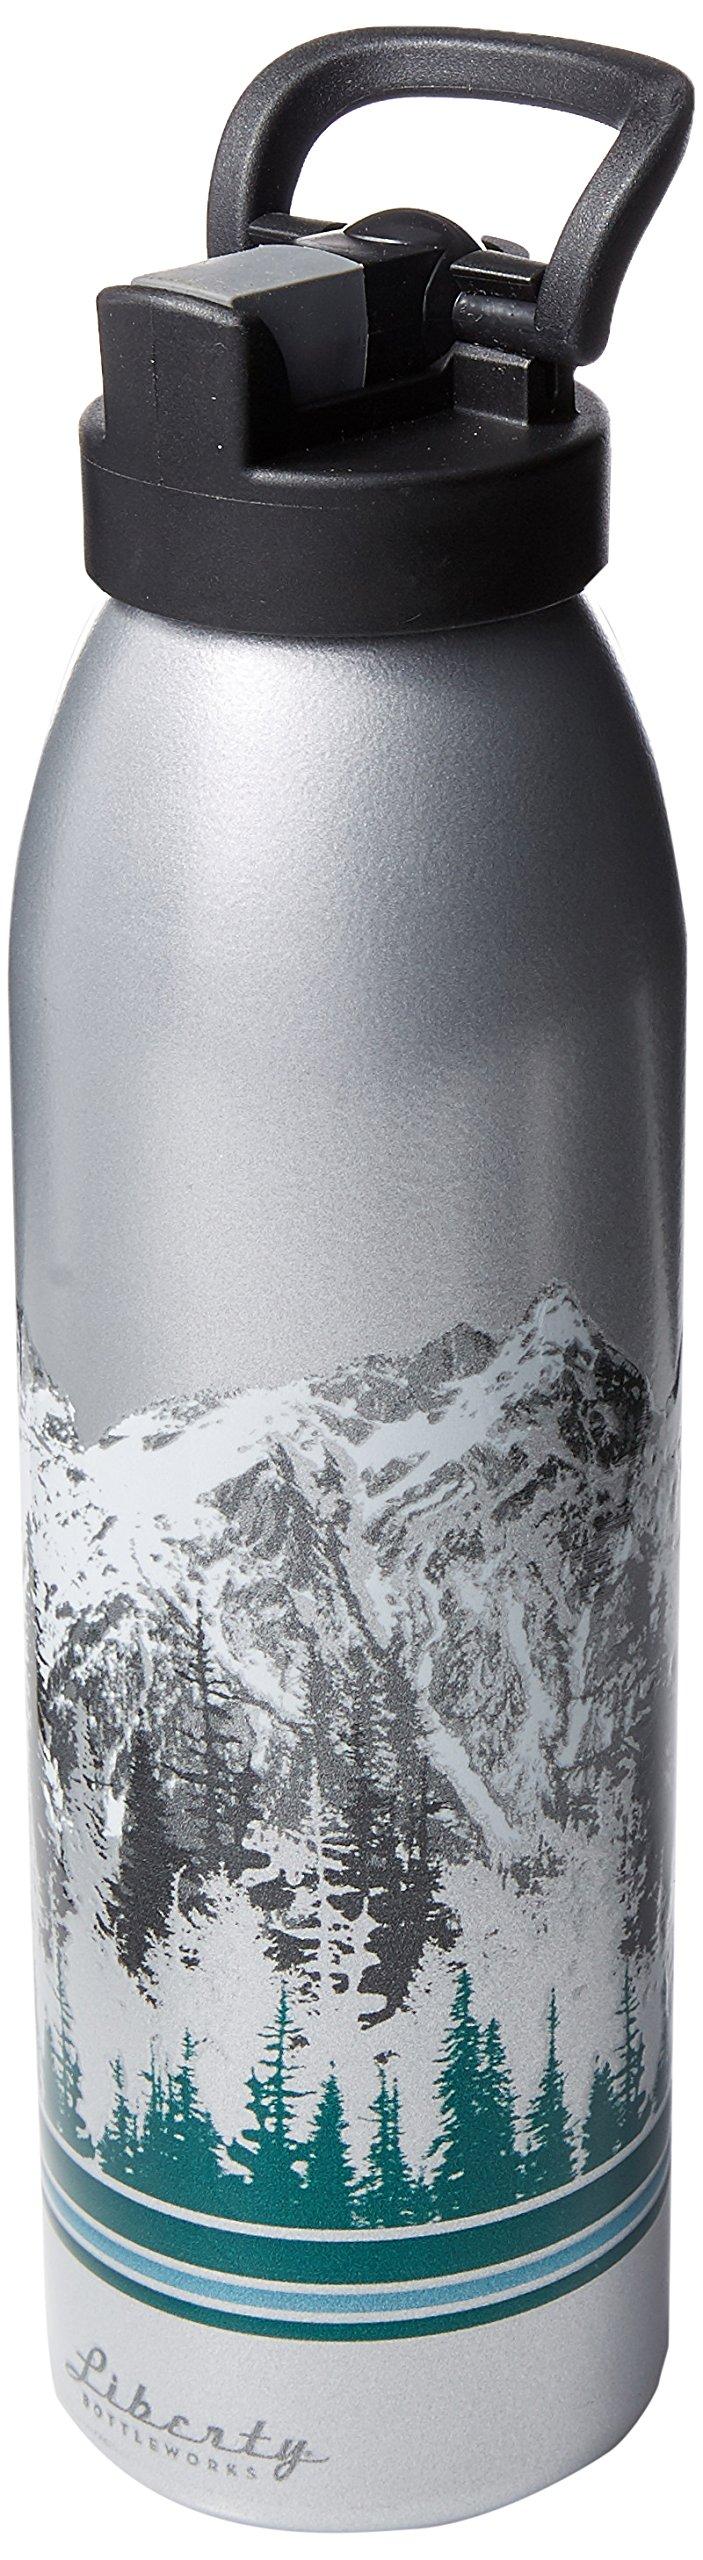 Liberty Bottleworks Ascent Aluminum Water Bottle, Made in USA, 24oz, Aluminum, Sport Cap